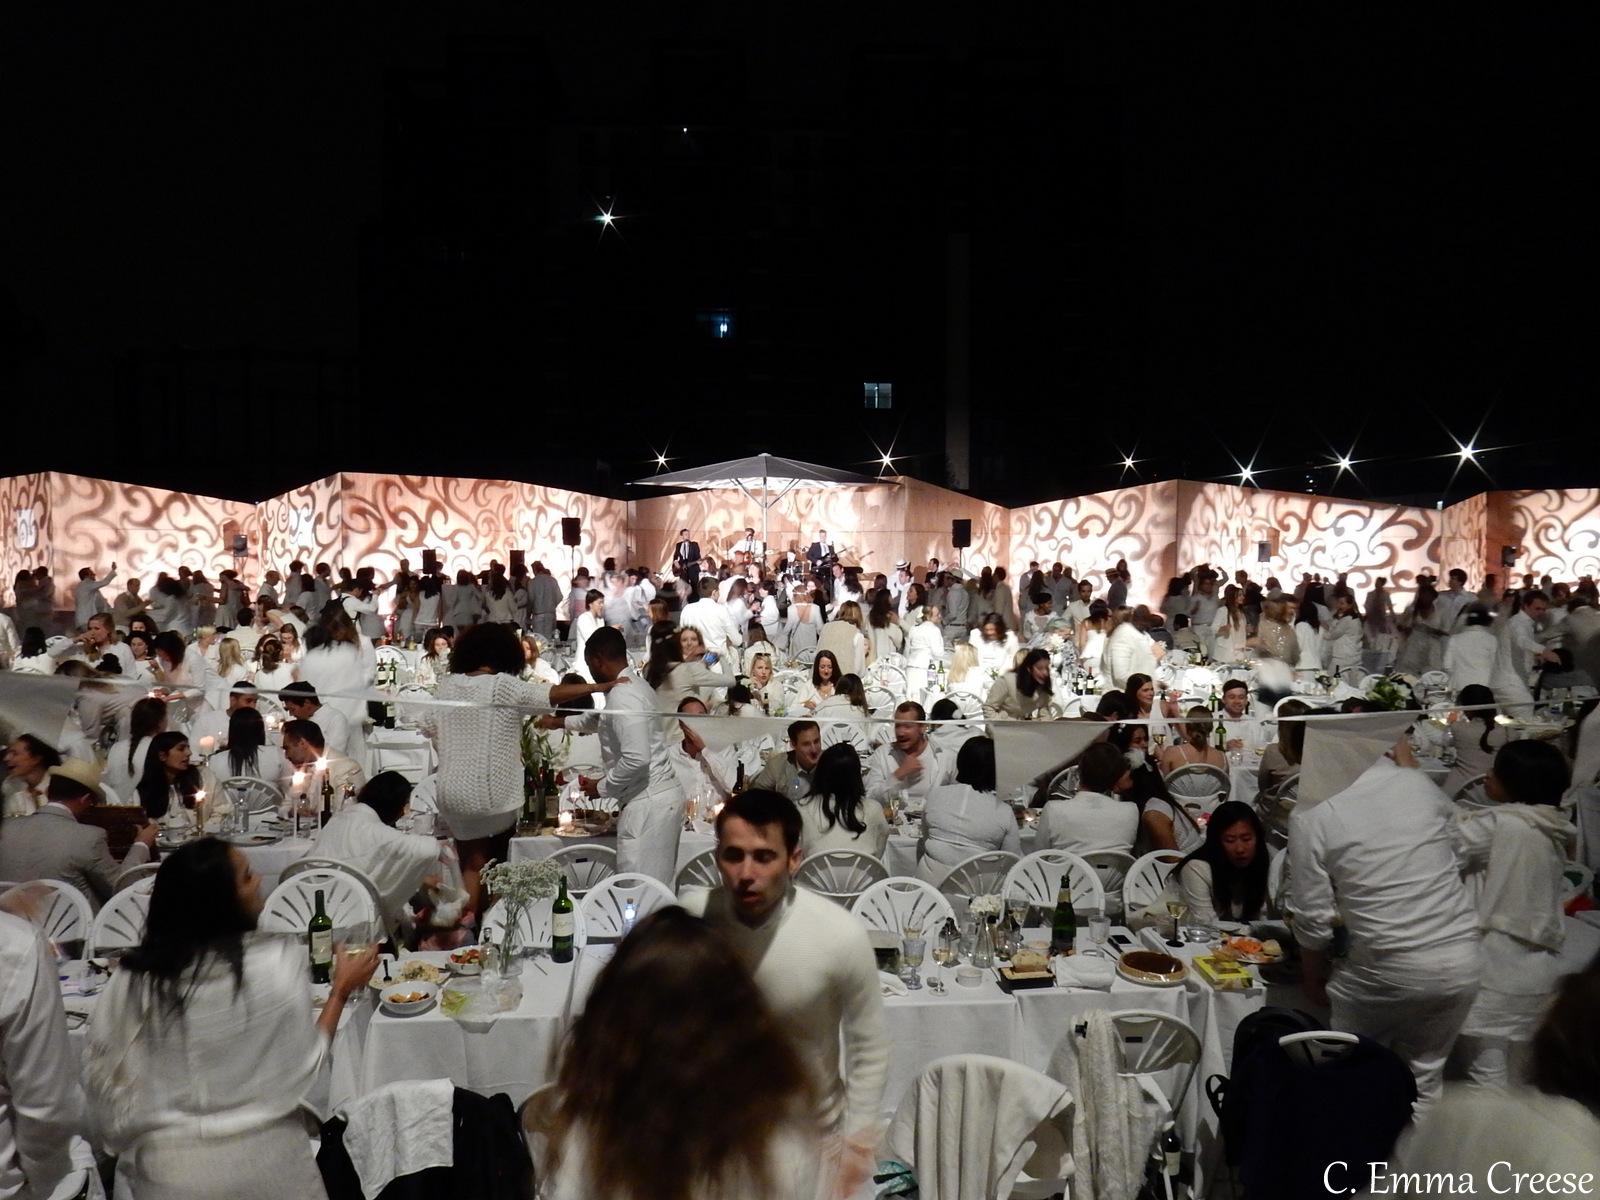 Diner en Blanc Adventures of a London Kiwi